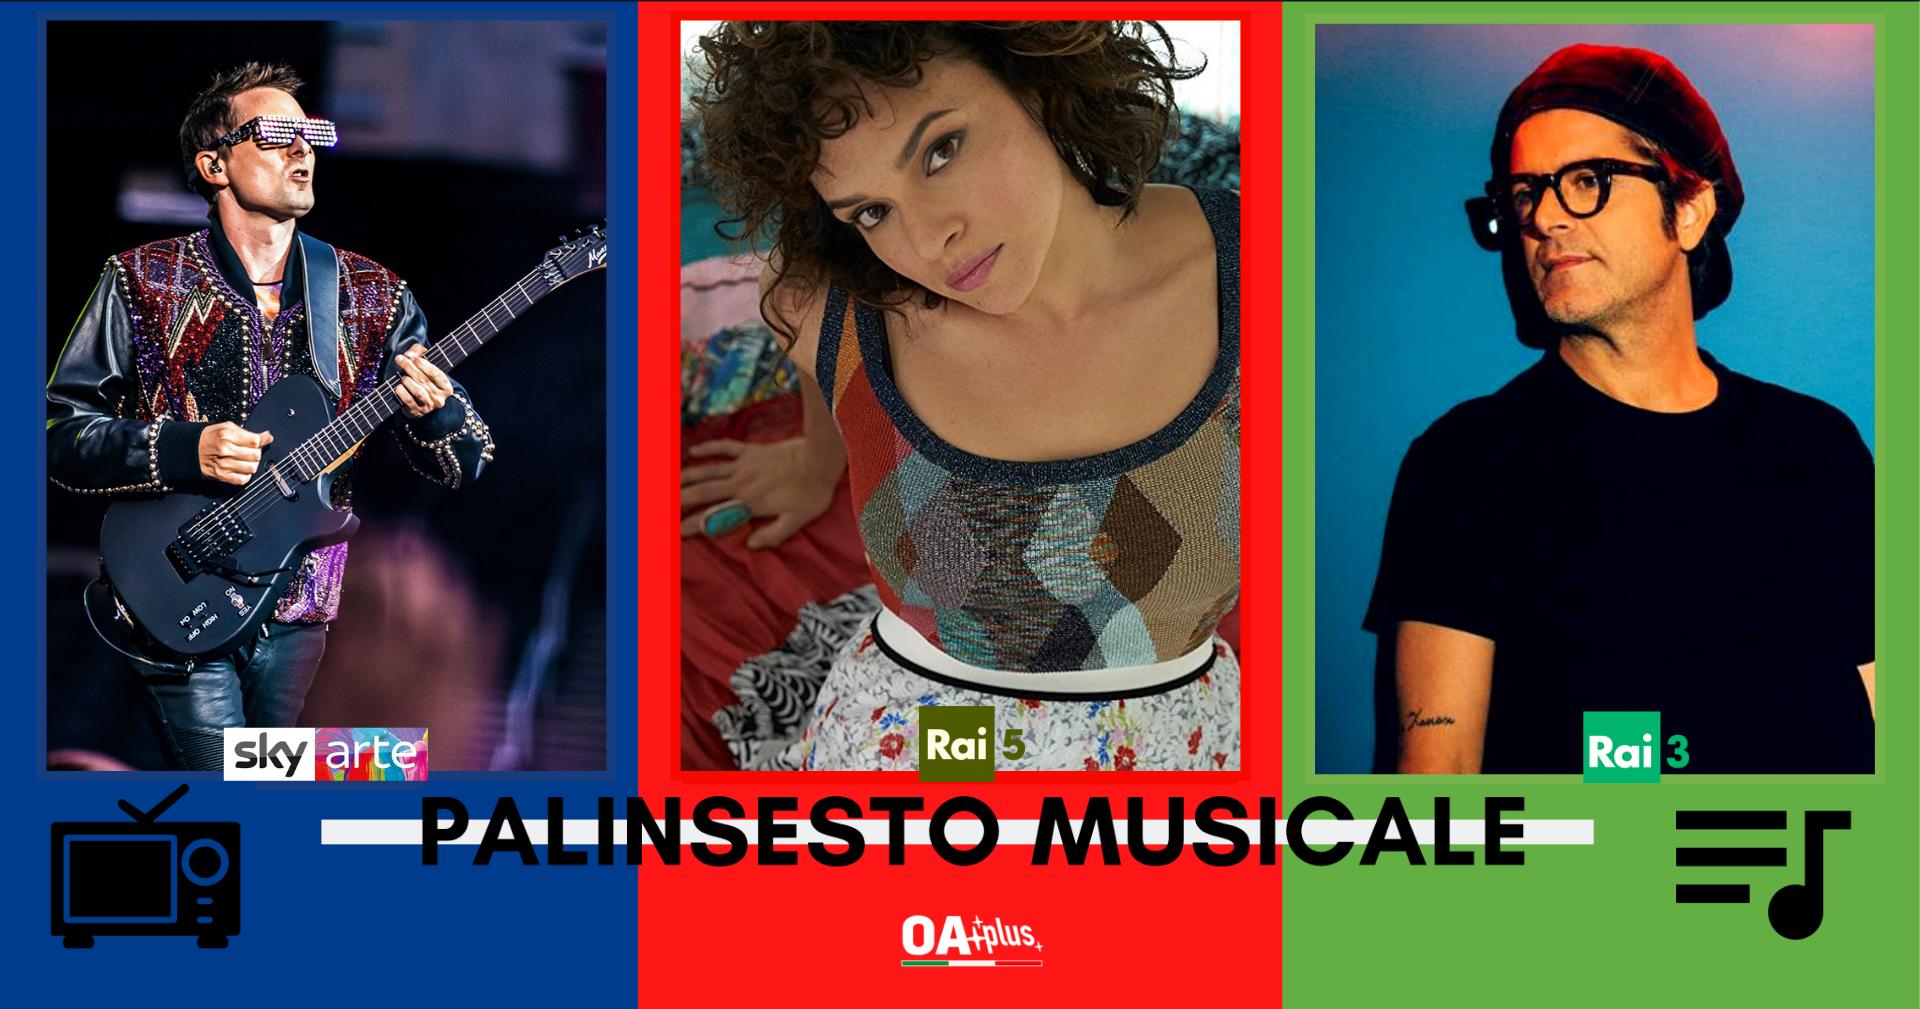 Rubrica, PALINSESTO MUSICALE: Muse, Norah Jones, Samuele Bersani